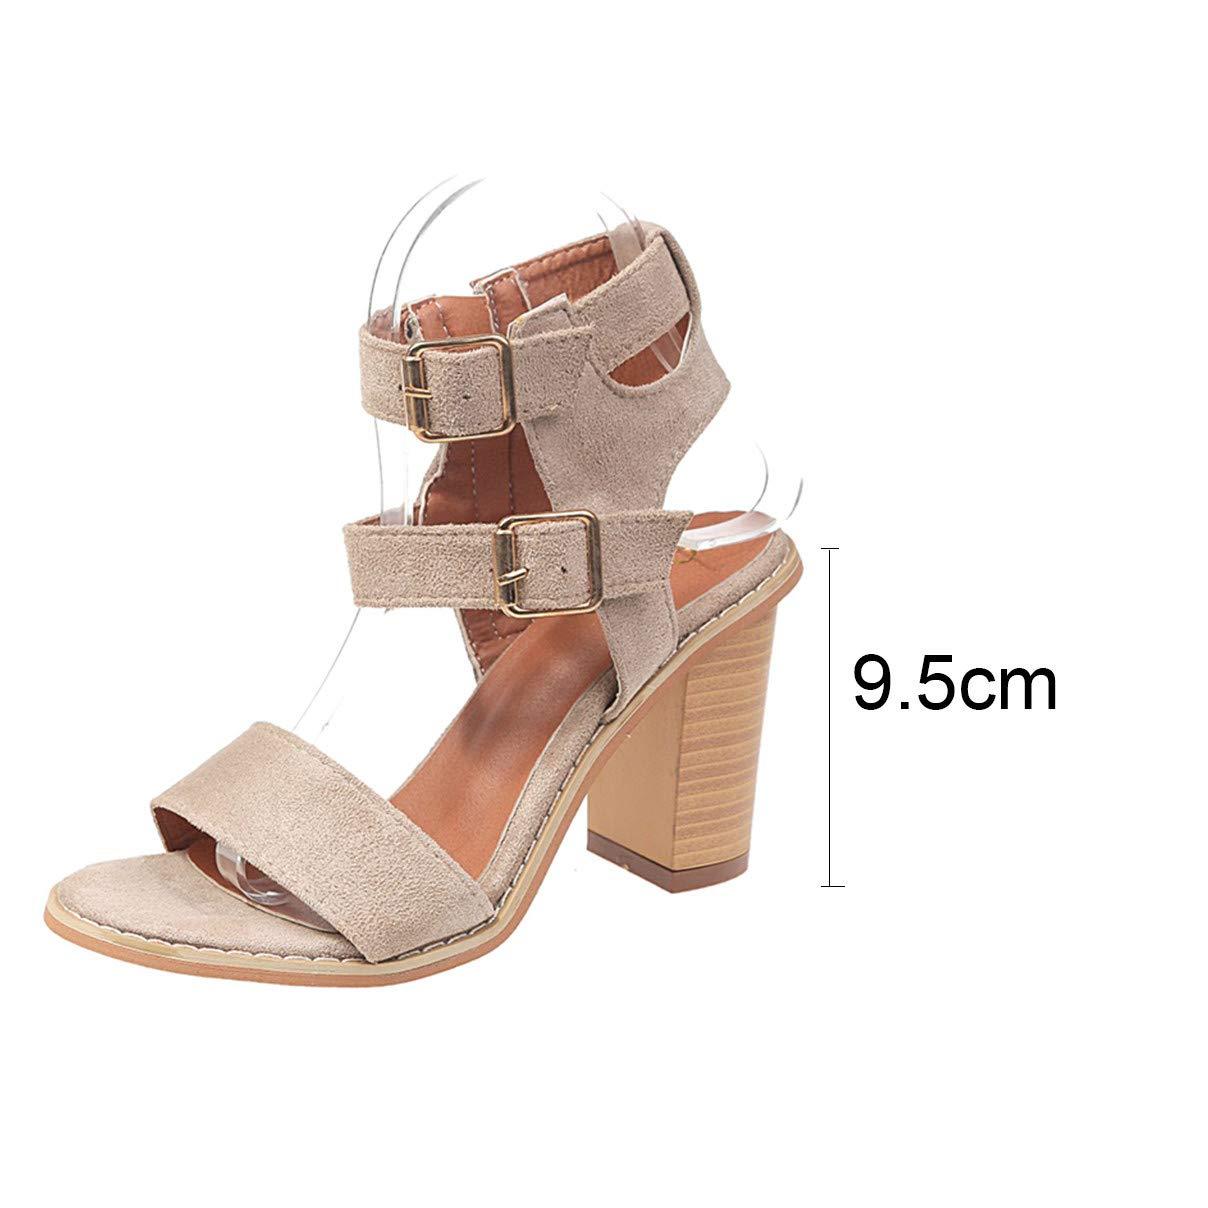 b1ce6c8e23267 Amazon.com: Women High Heel Square Sandals, NDGDA Ladies Fashion ...